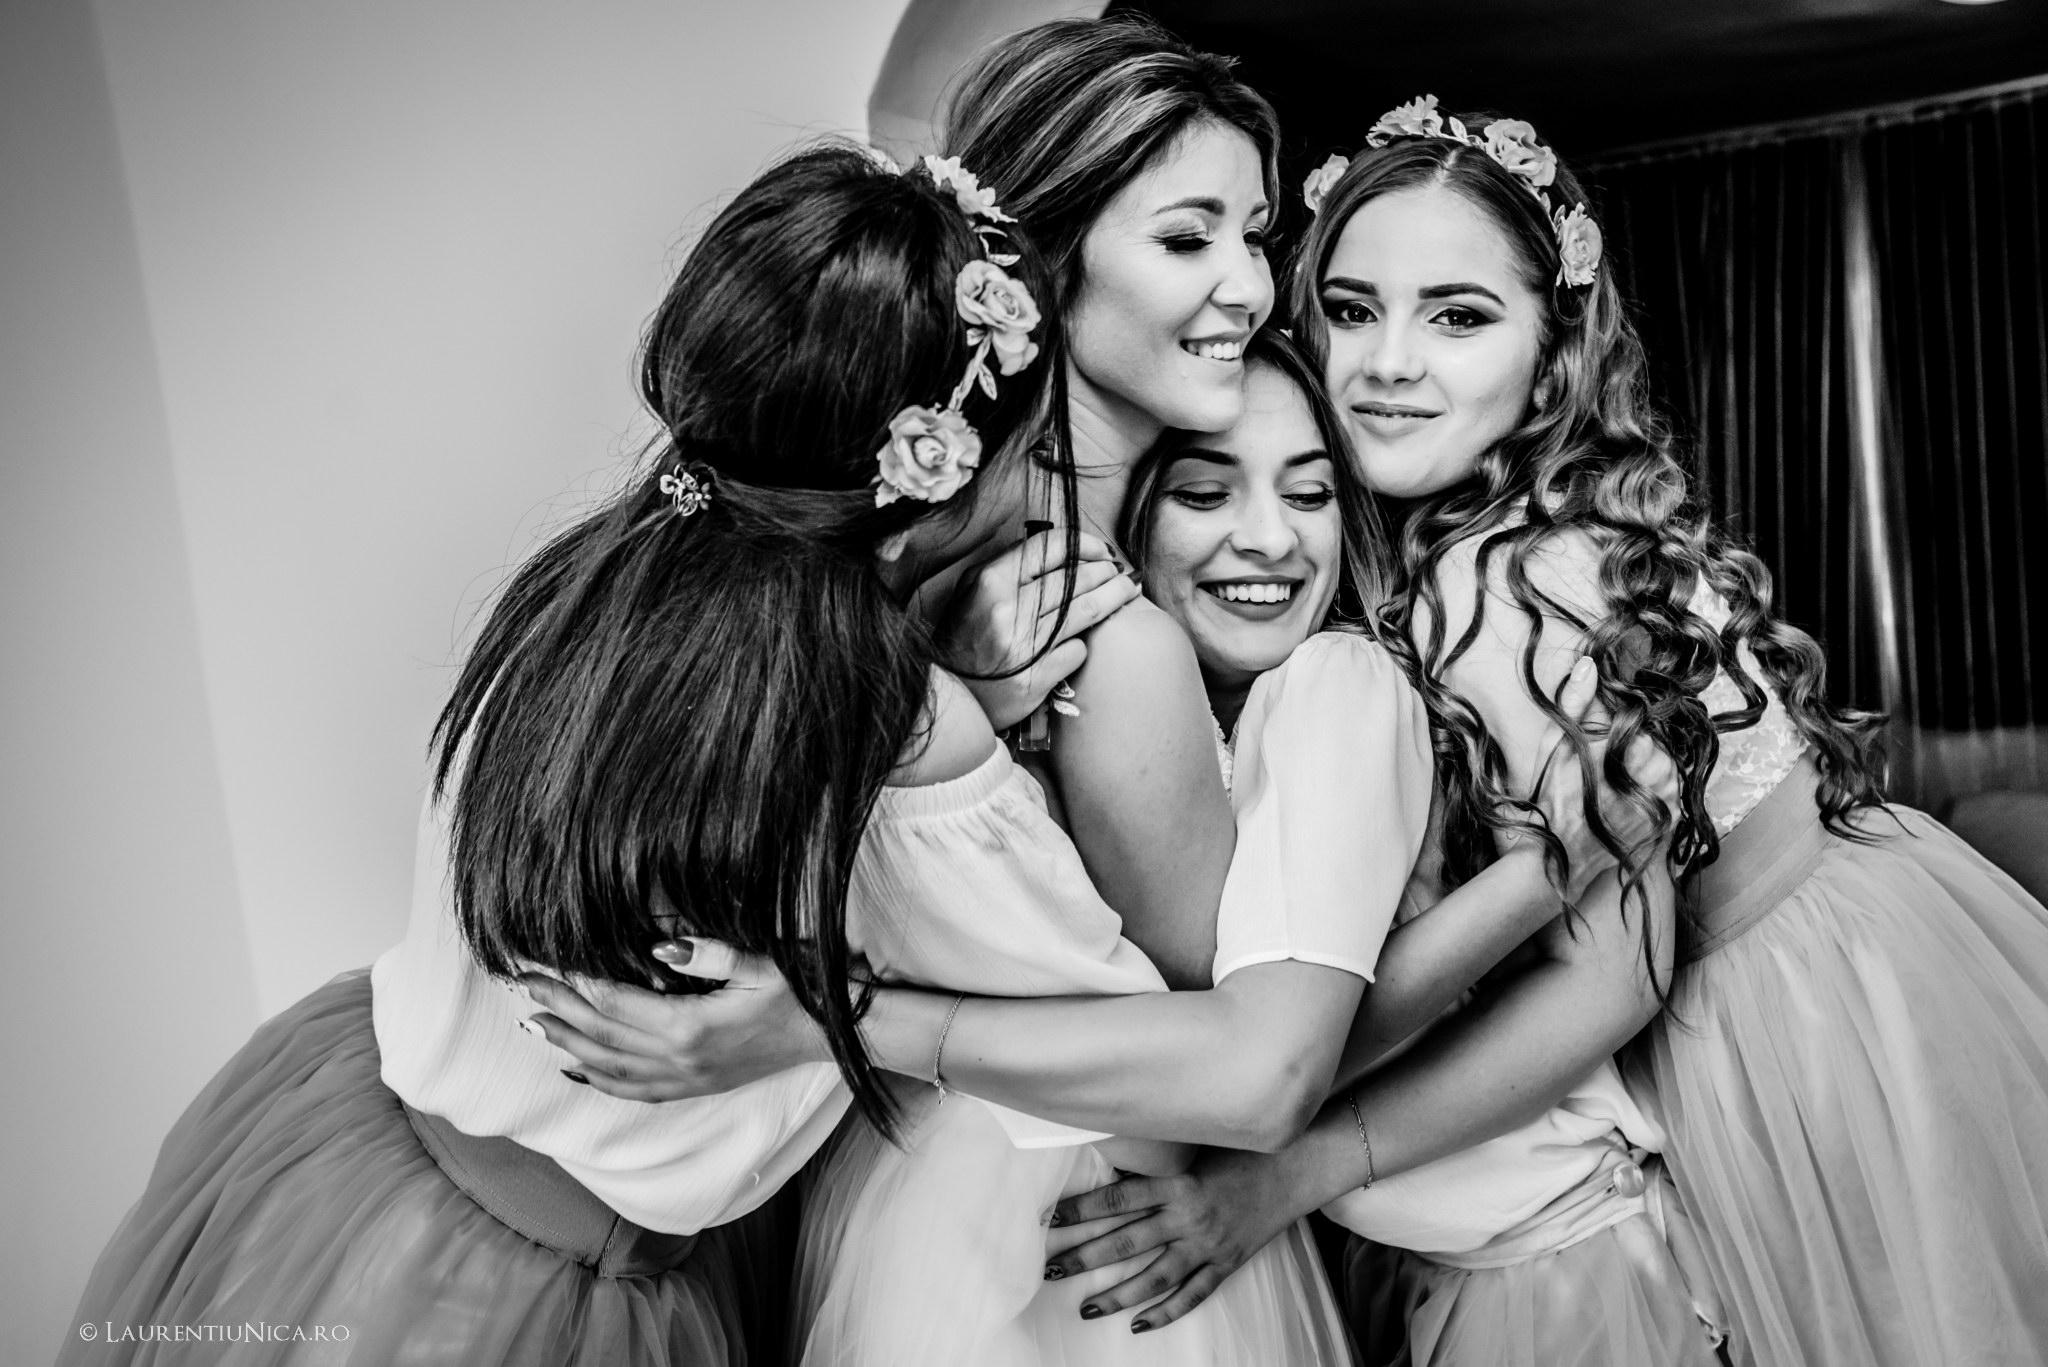 madalina madalin fotograf nunta laurentiu nica turceni gorj 05 - Madalina & Madalin | Fotografii nunta | Judetul Gorj